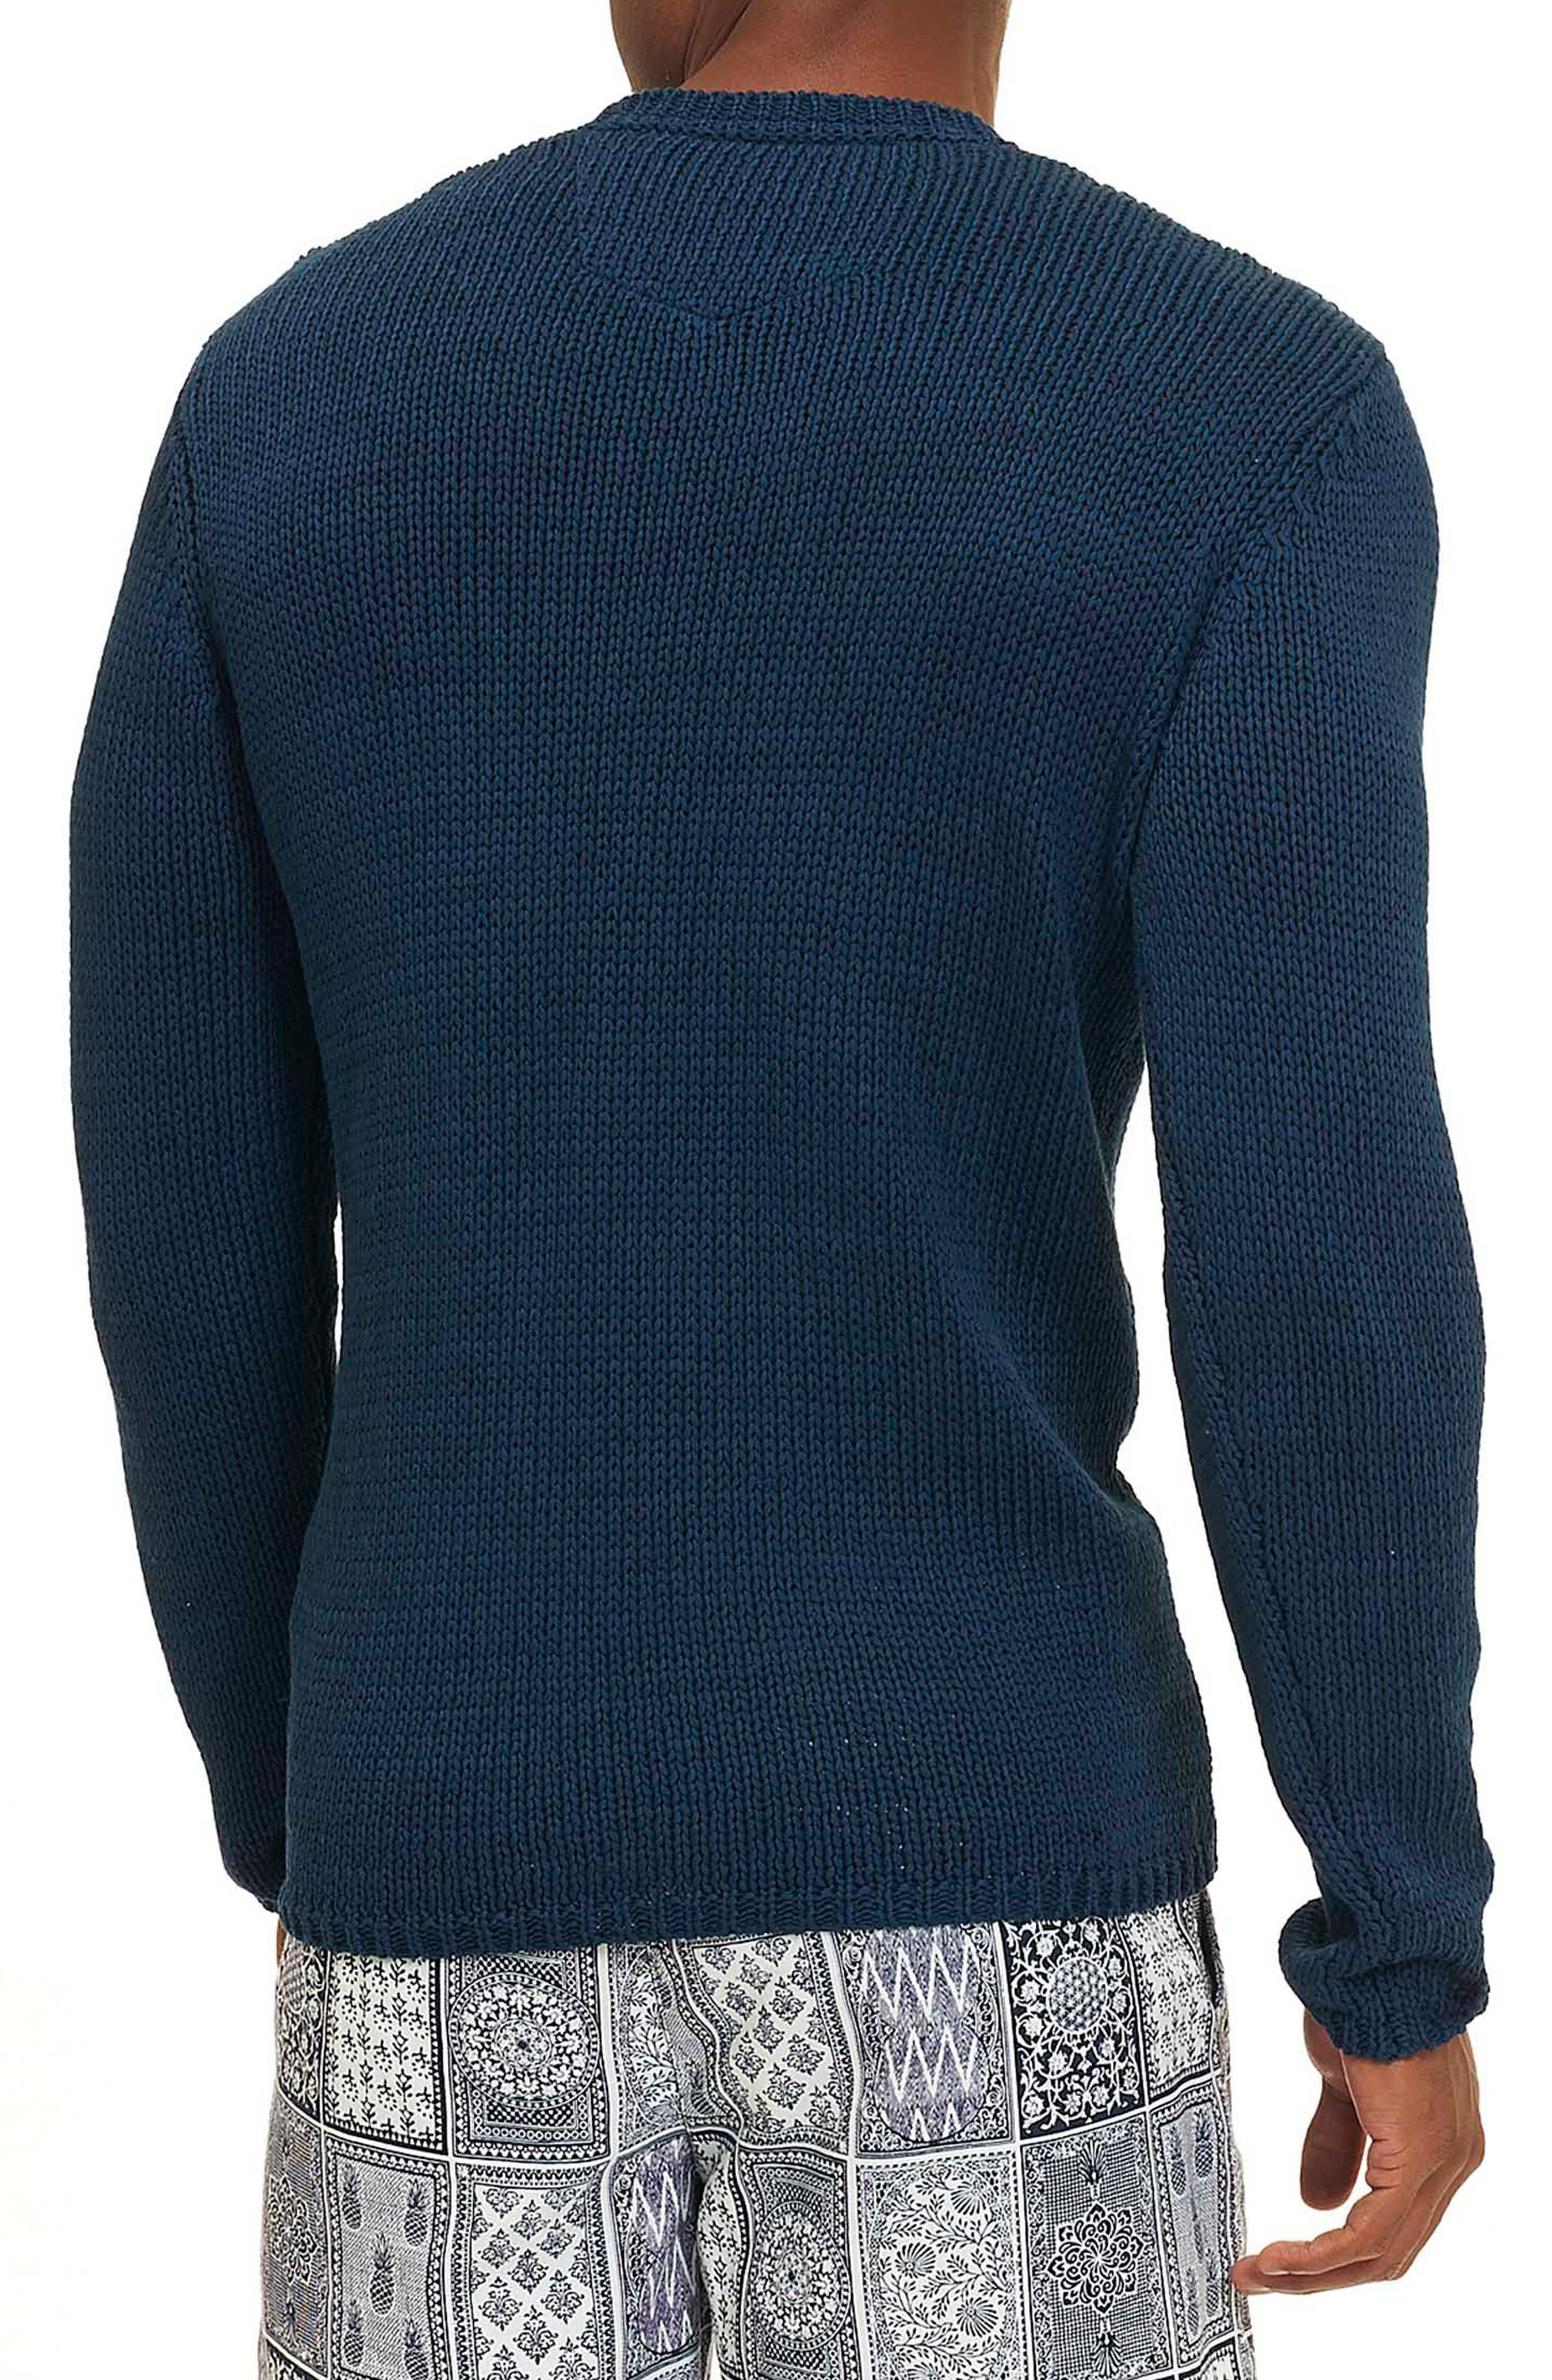 Keratons Sweater,                             Alternate thumbnail 2, color,                             Blue